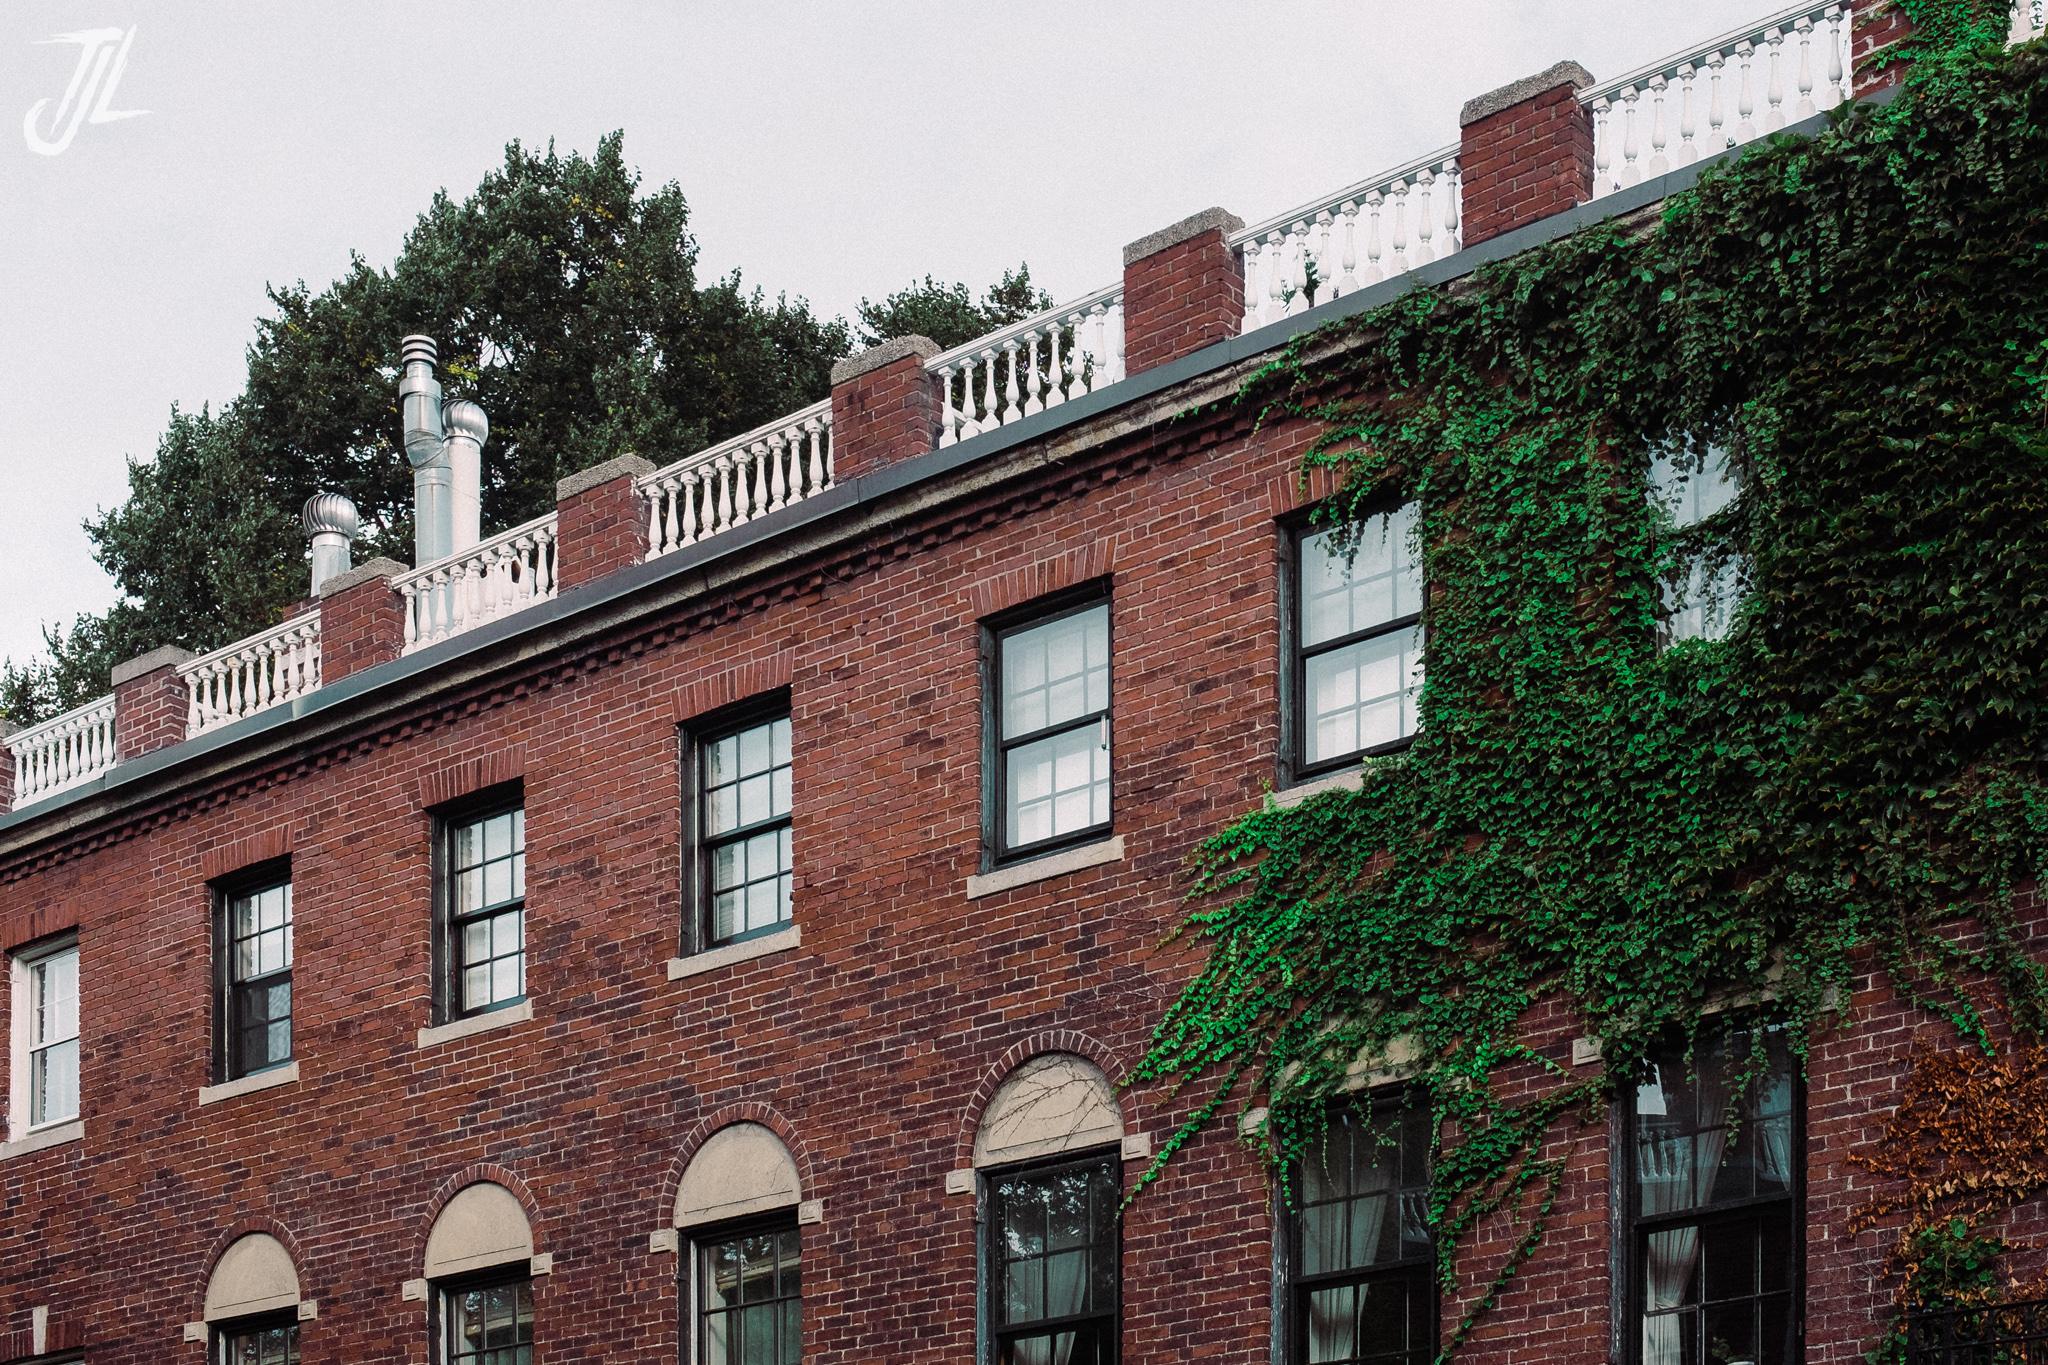 Ivy & Houses